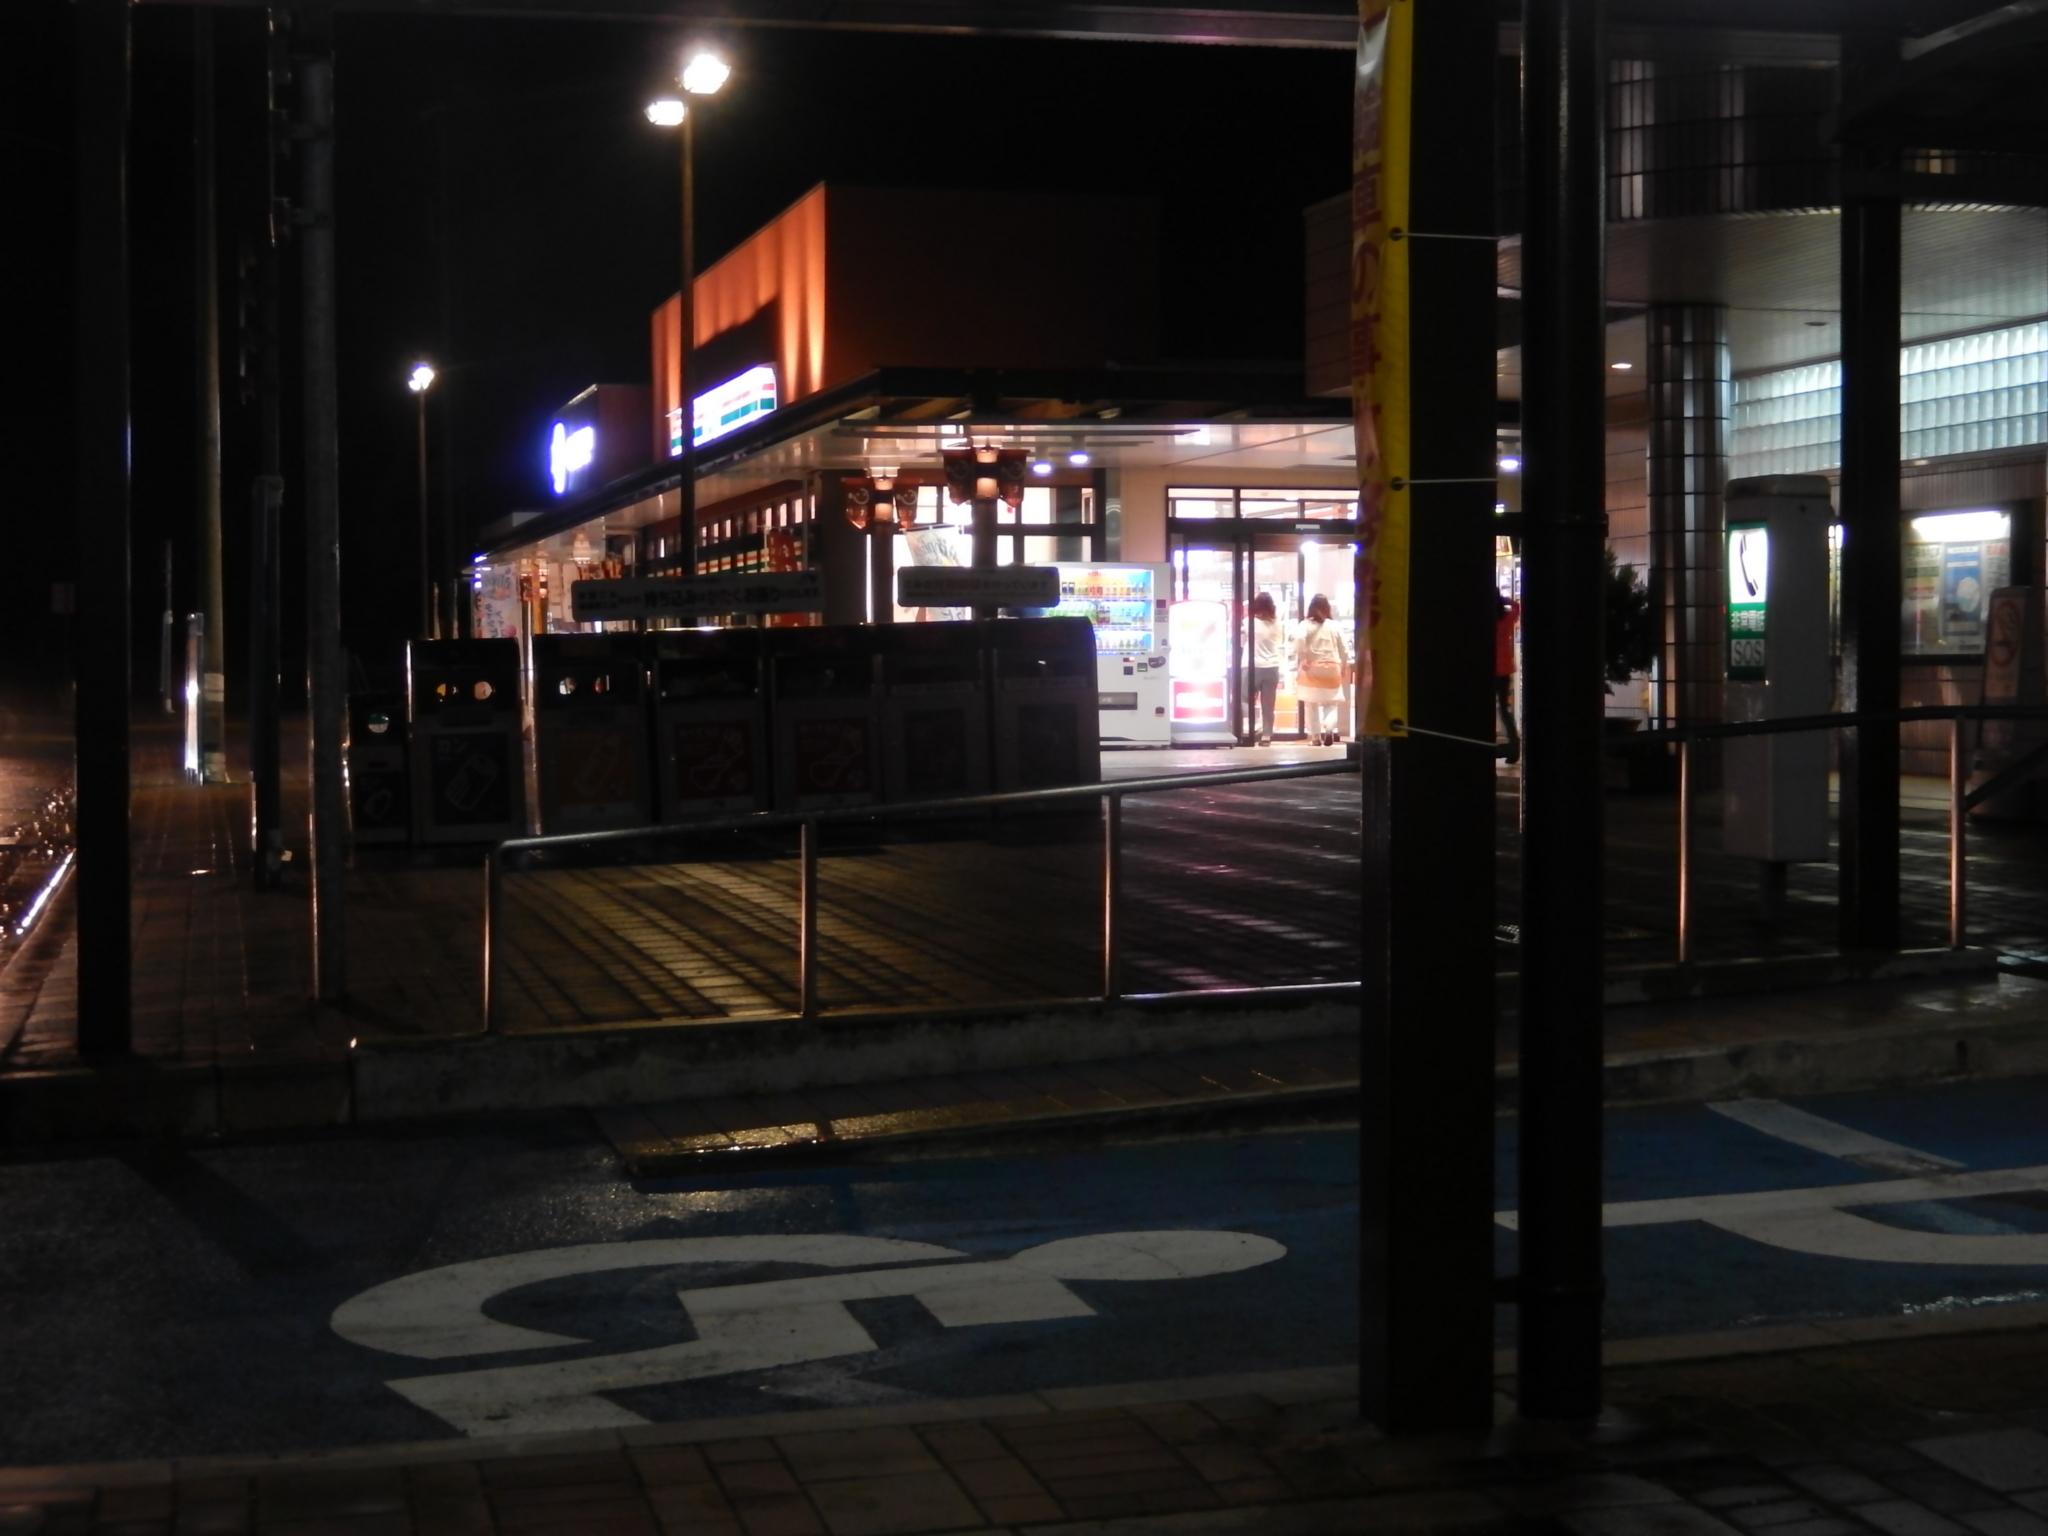 f:id:ToshUeno:20150503213959j:plain